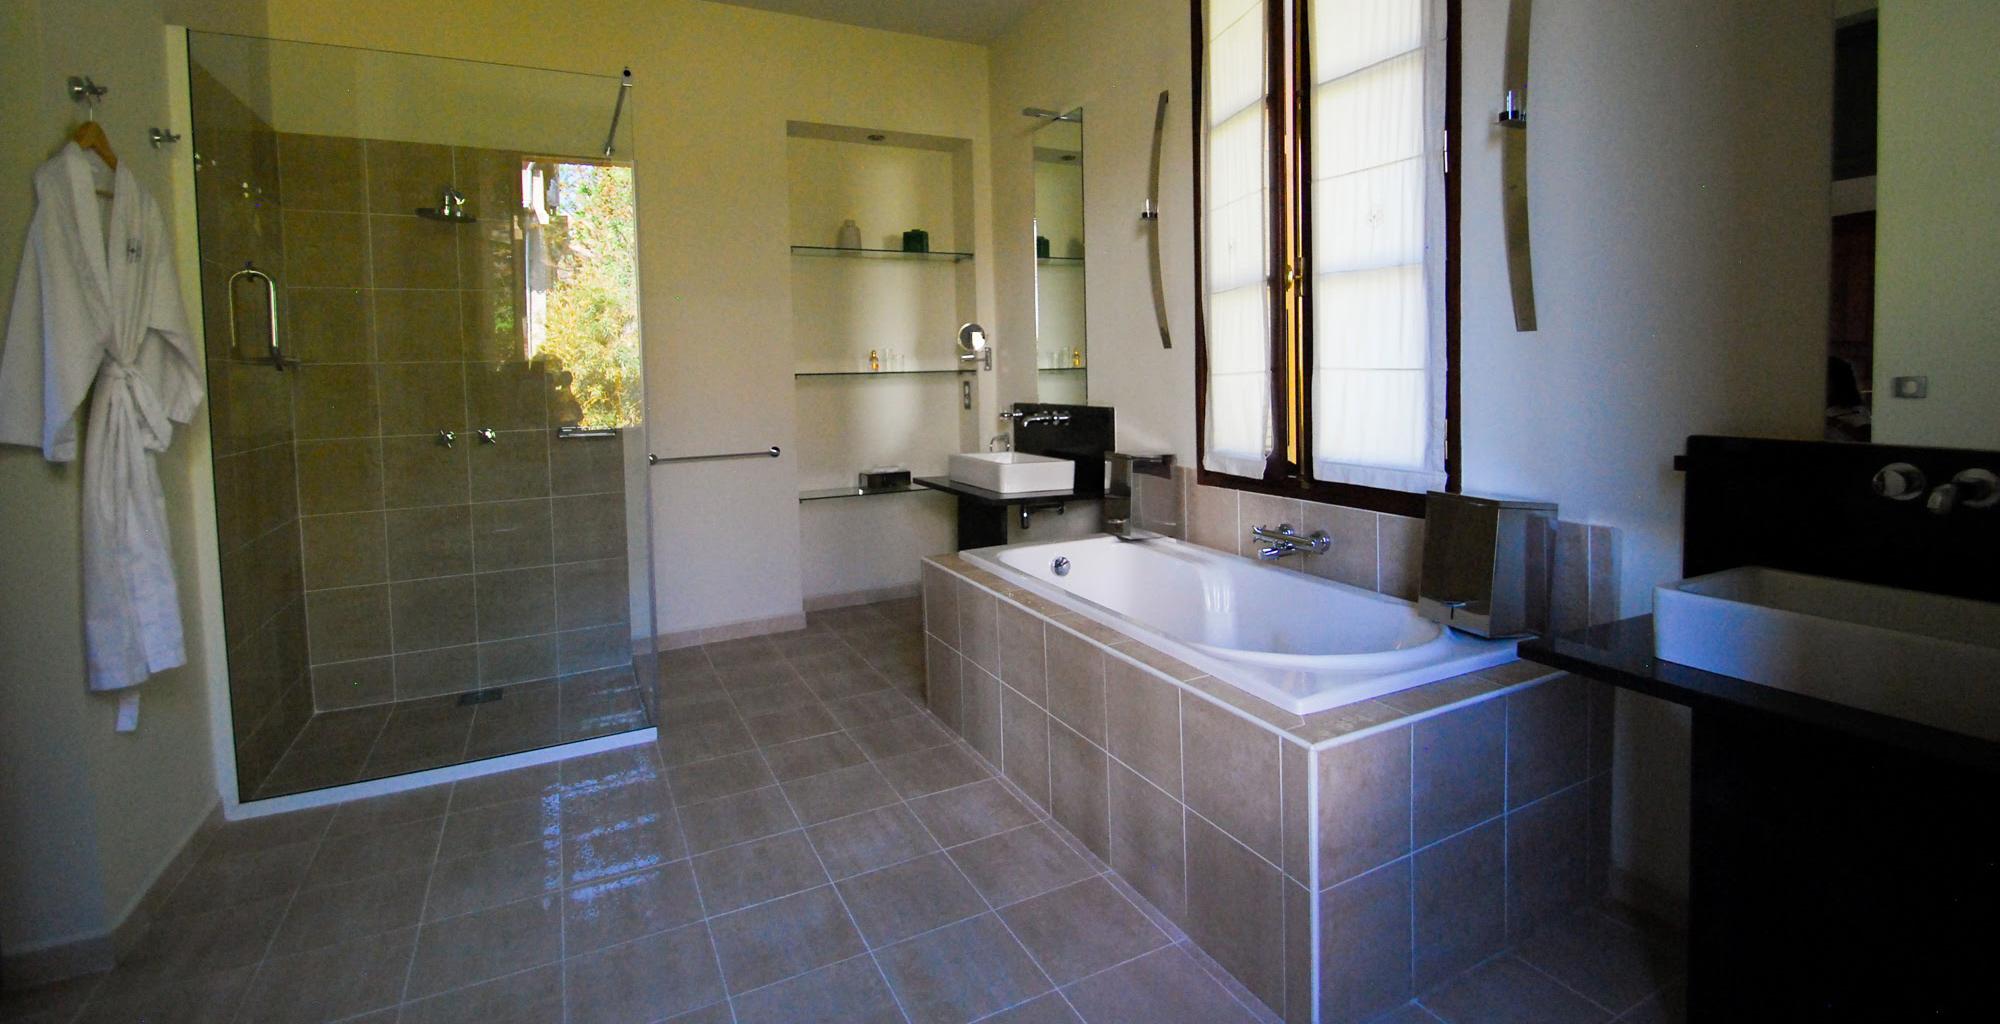 Madagascar-Maison-Gallieni-Bathroom